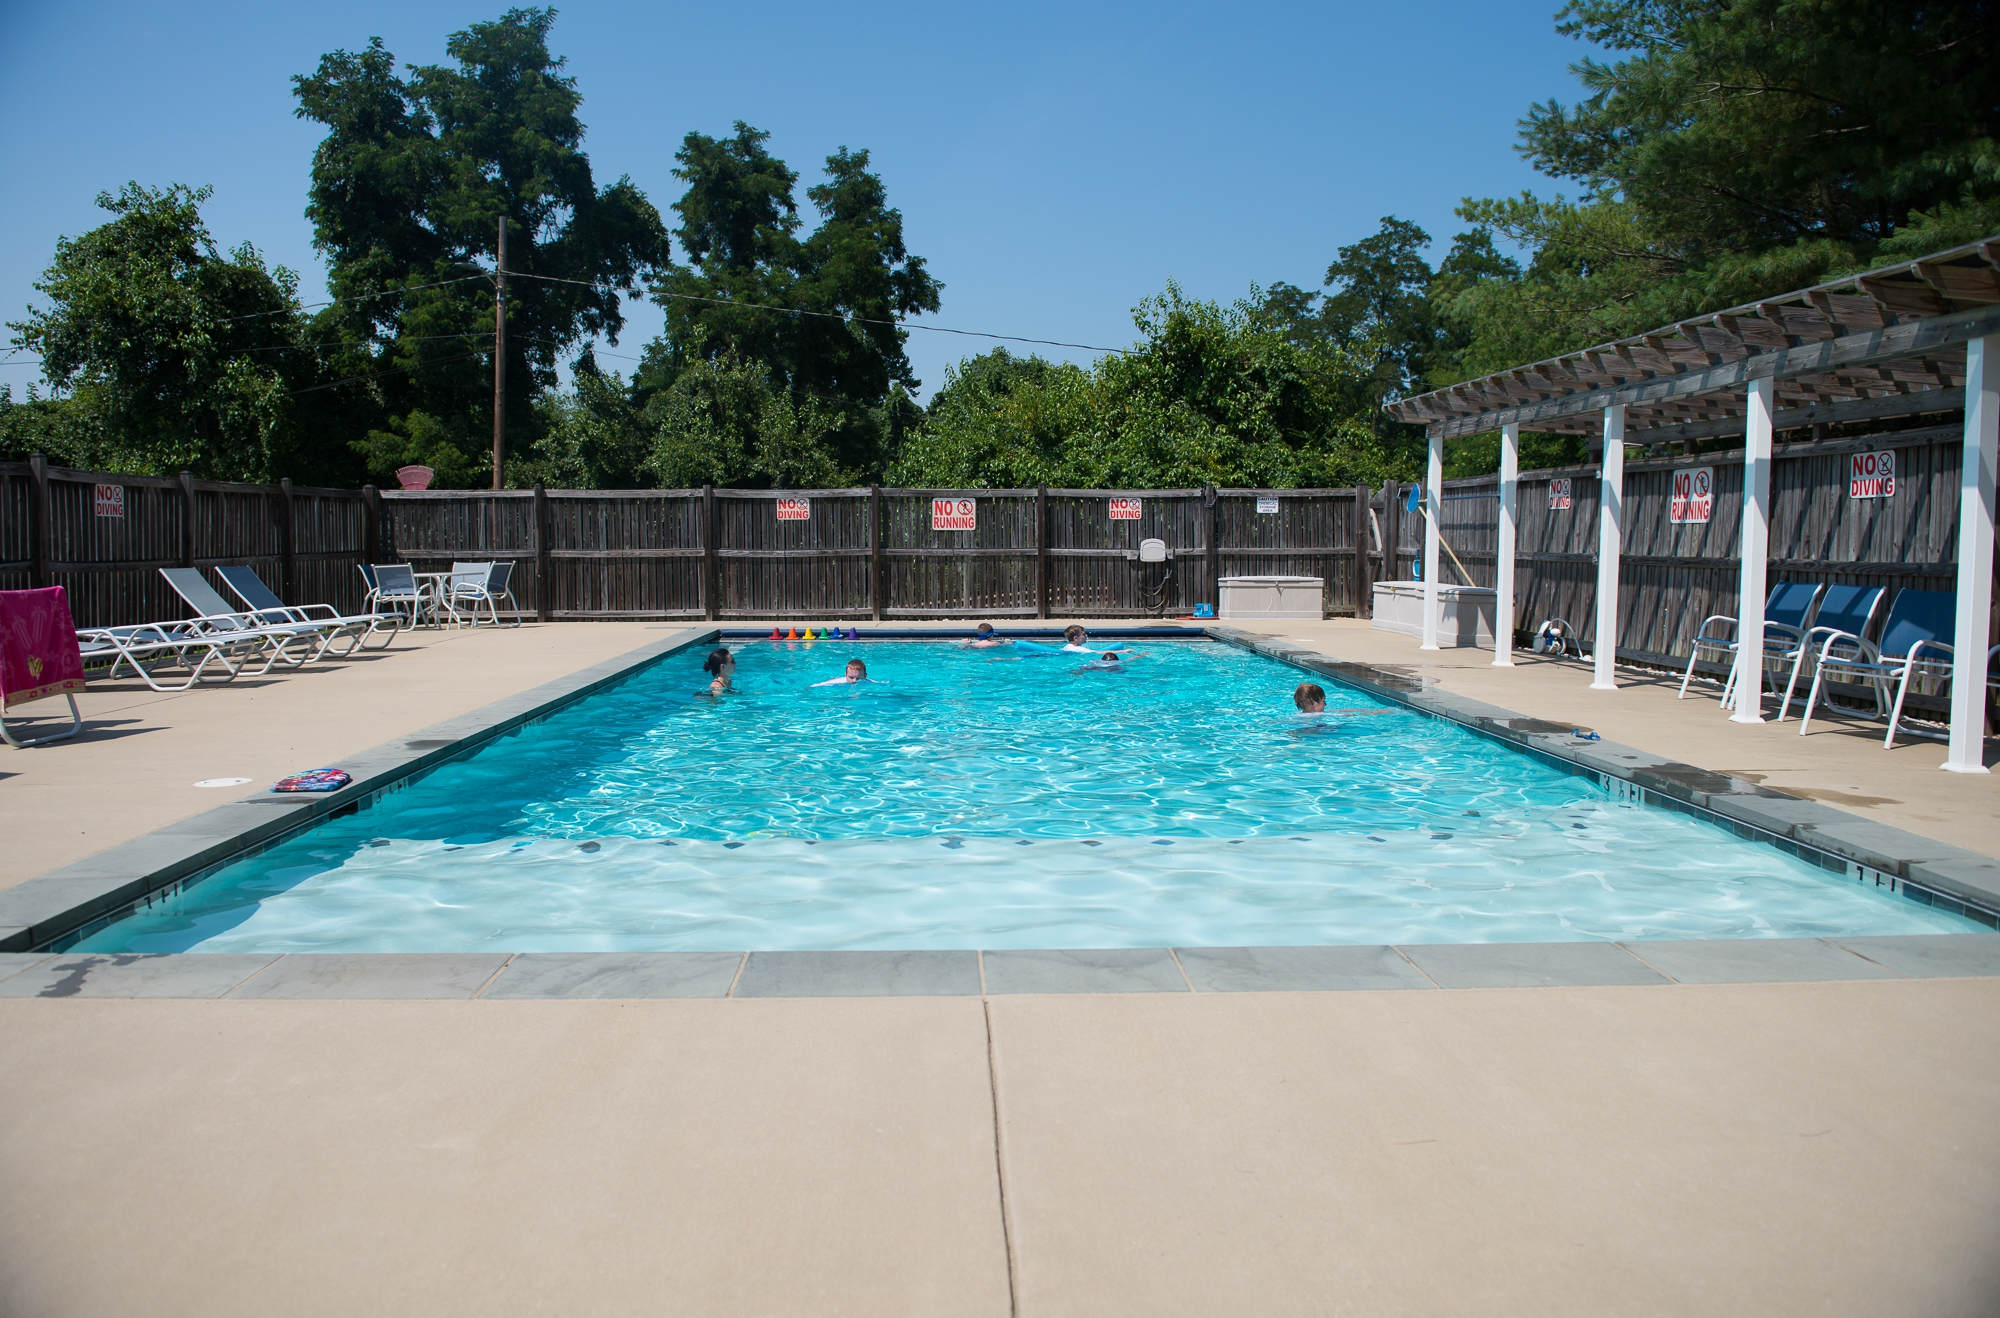 <p>The pool</p>